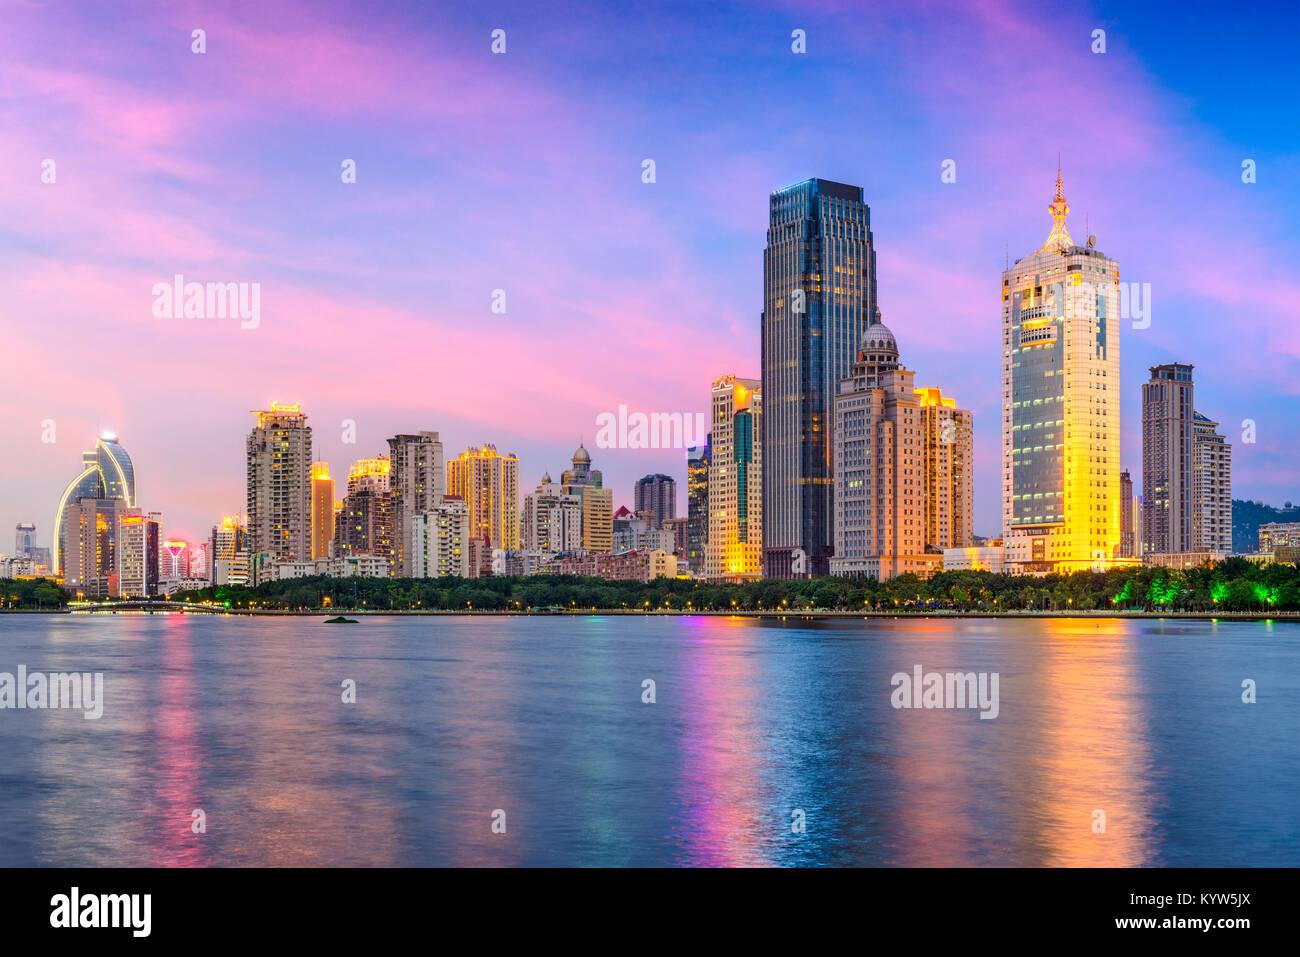 Xiamen, China city skyline from Gulangyu Island. - Stock Image